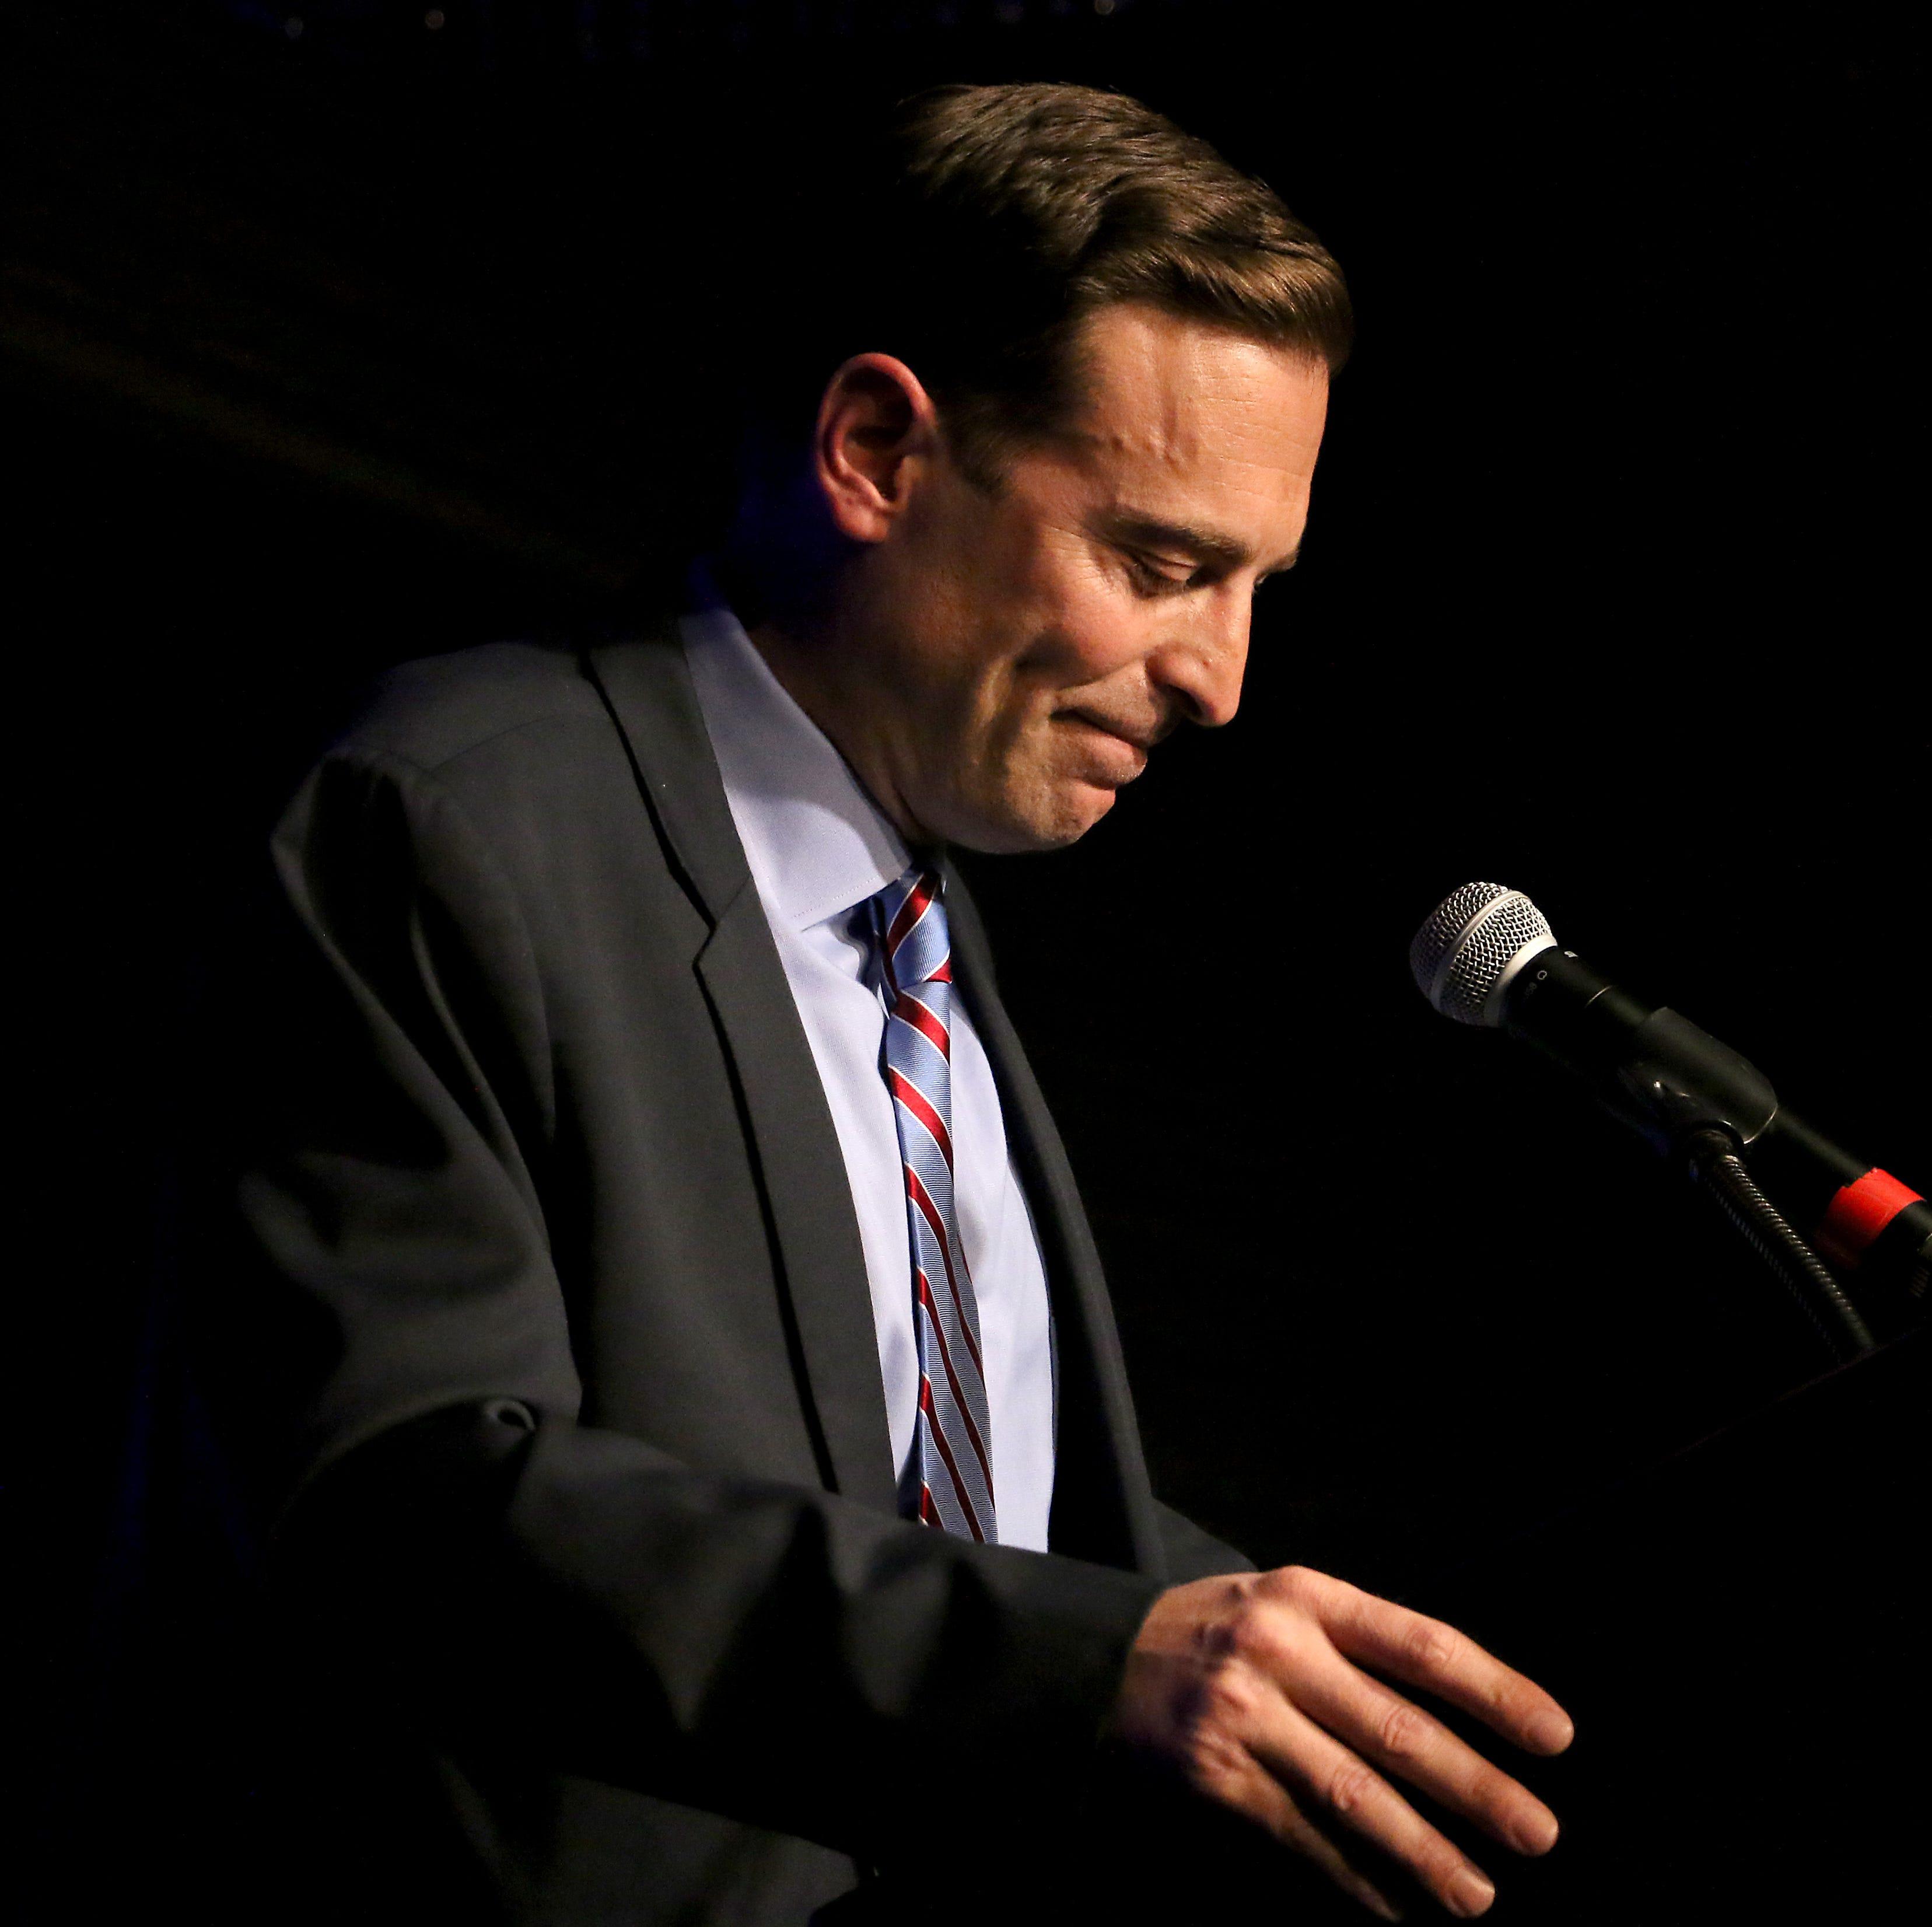 D.C. Republicans fault Washoe GOP's 'strategic blunders' ahead of sweeping midterm defeats